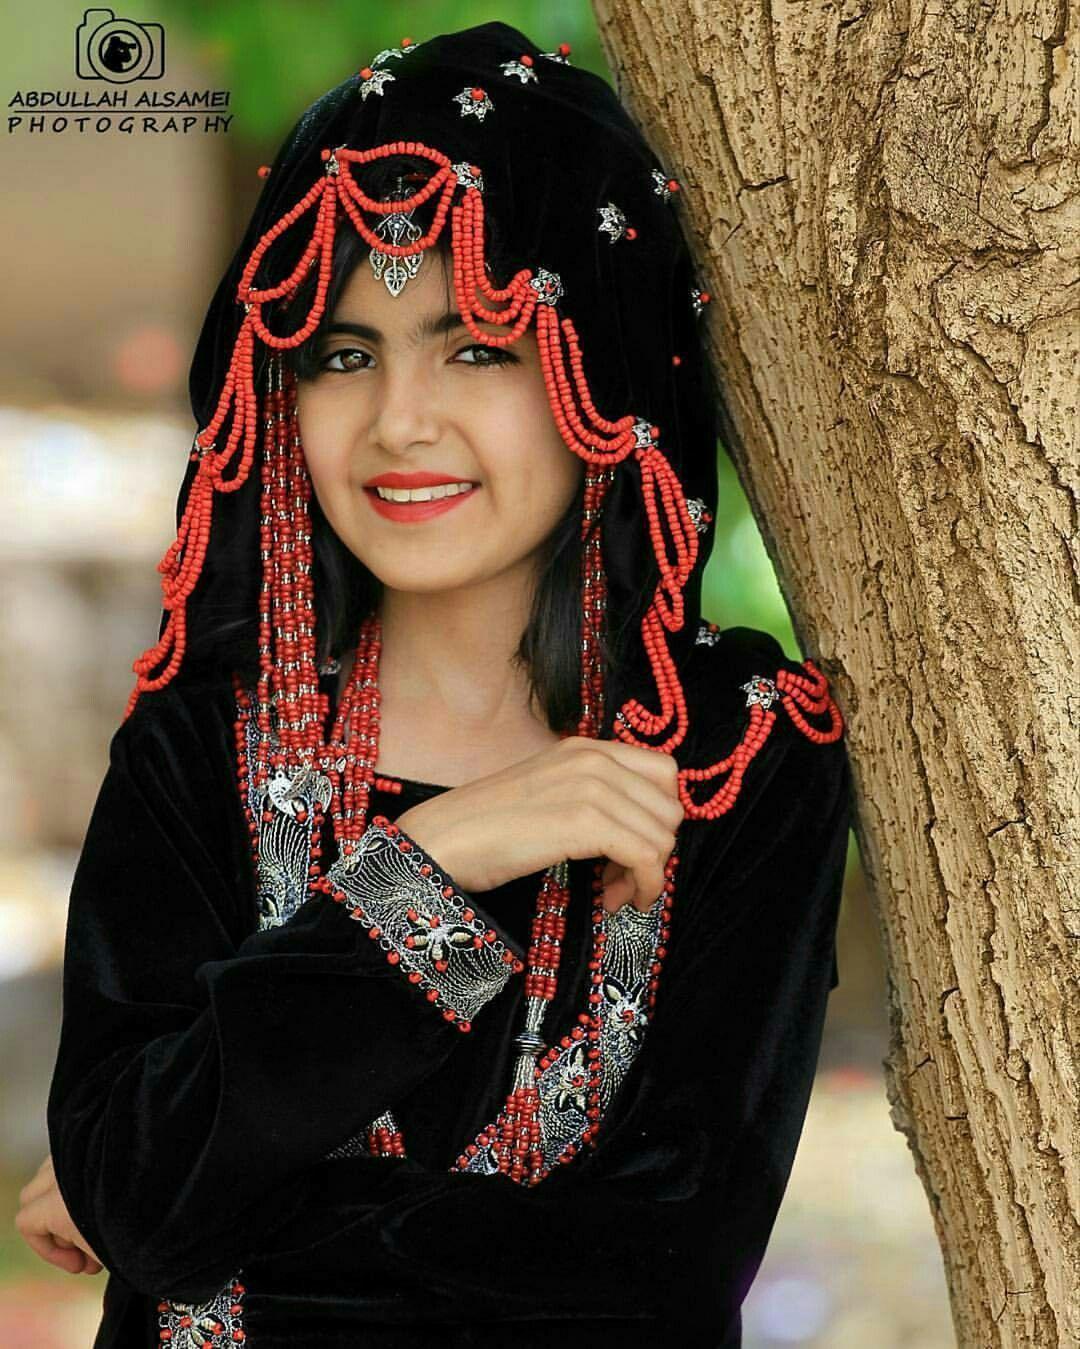 Custom Baby /& Toddler T-Shirt Everyone Loves A Nice Yemeni Girl Yemen Cotton